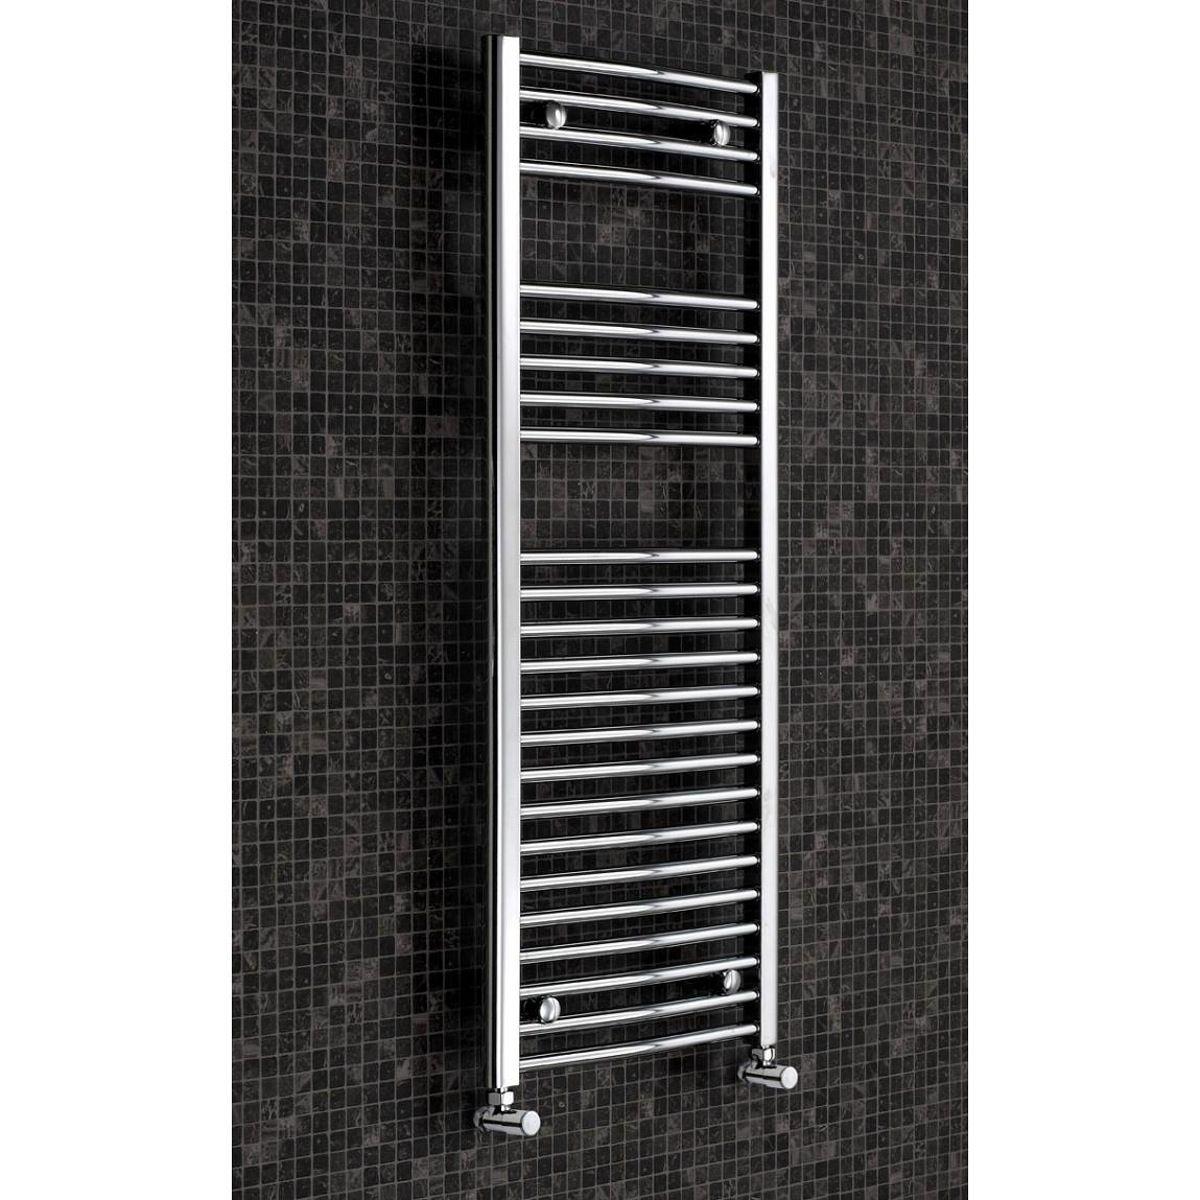 Orchard Elsdon heated towel rail 1150 x